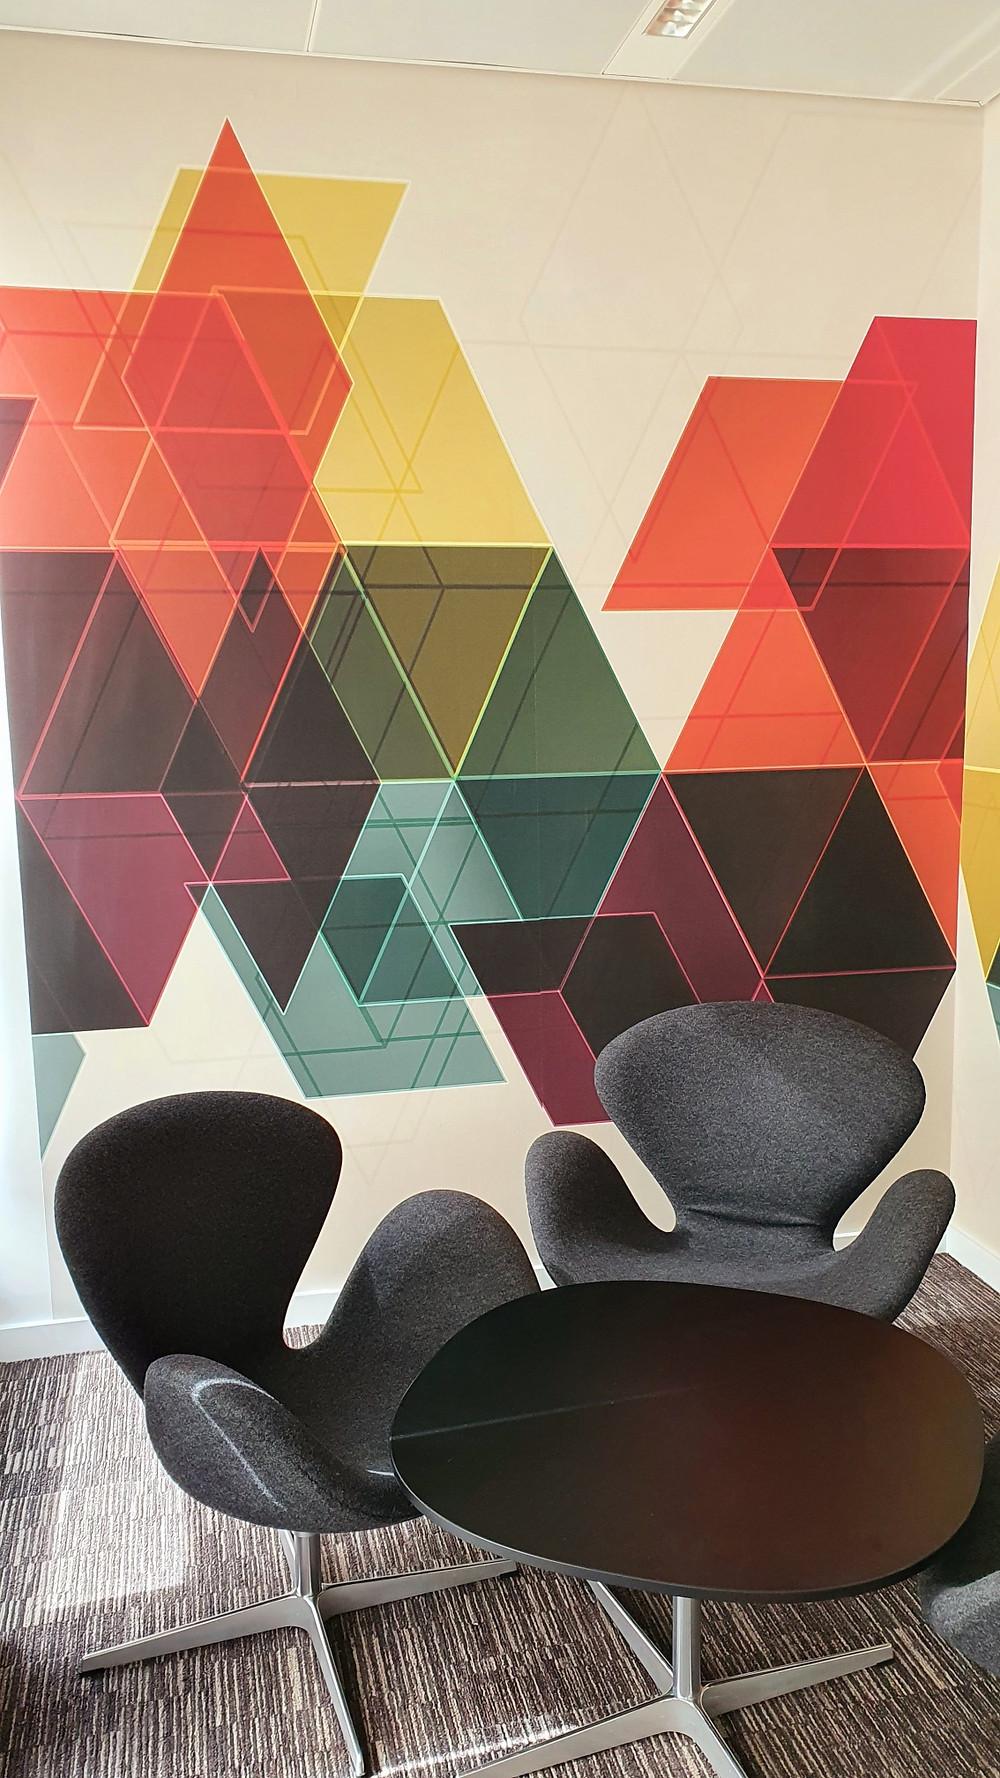 Siège social AXA Luxembourg papier-peint